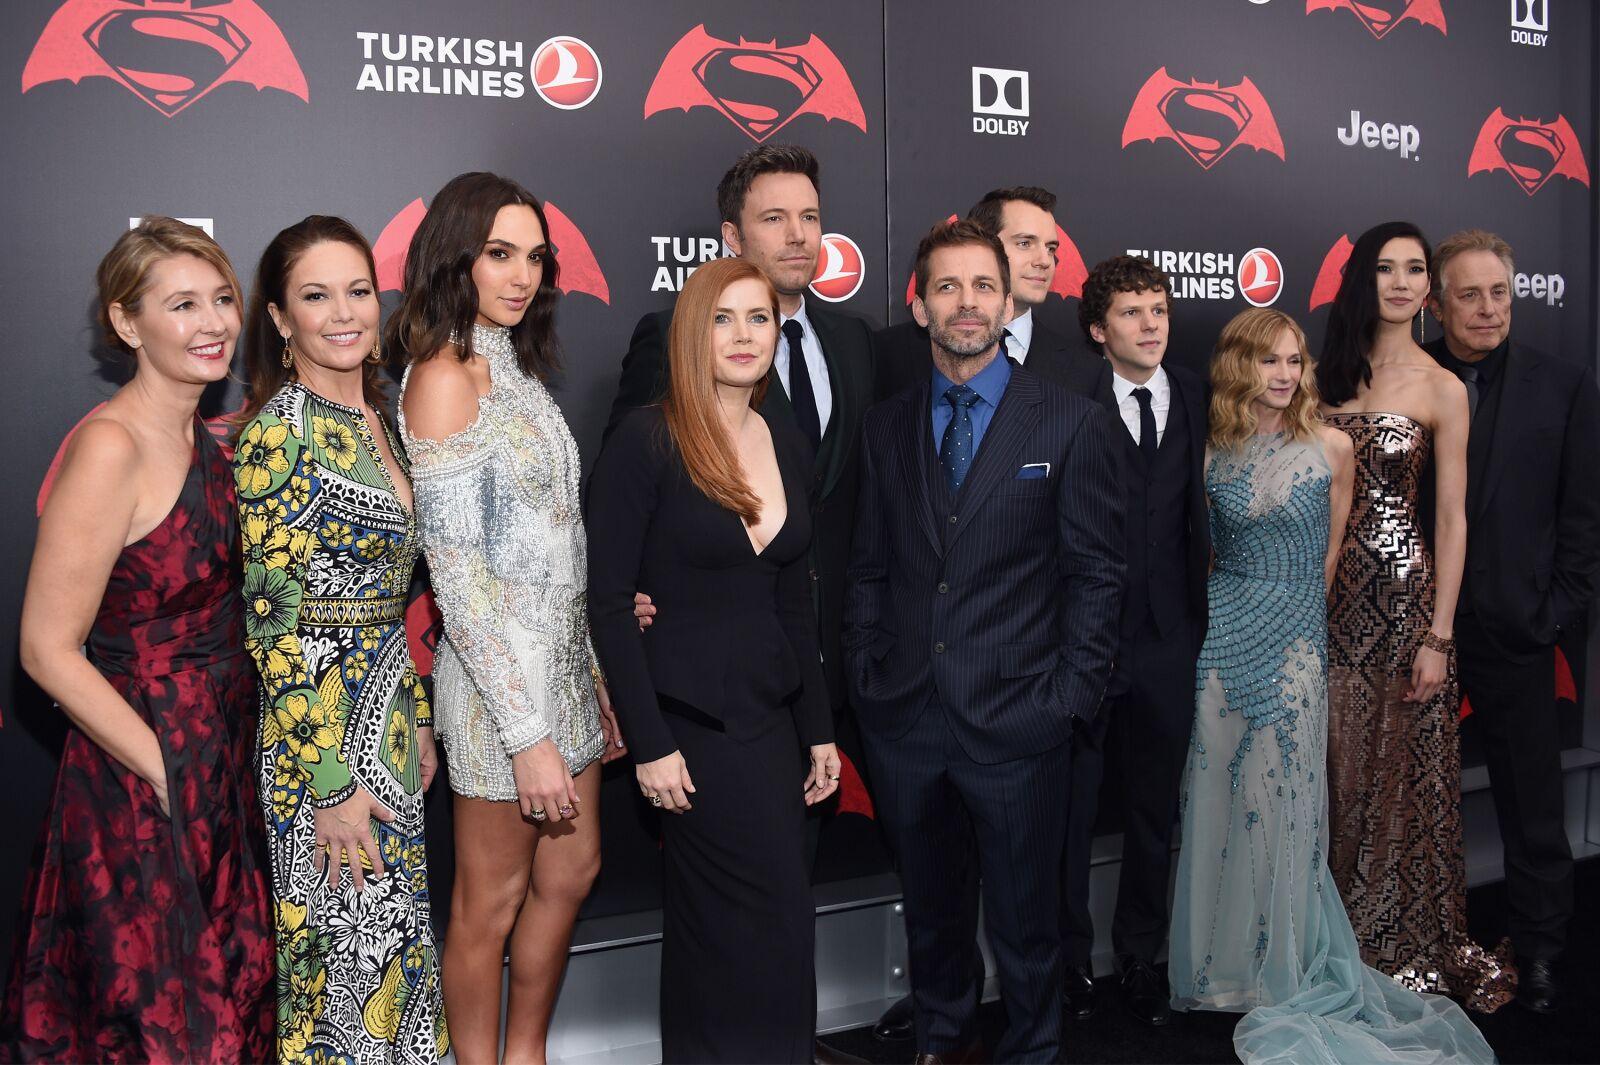 Justice League stars demand Warner Bros. #ReleaseTheSnyderCut